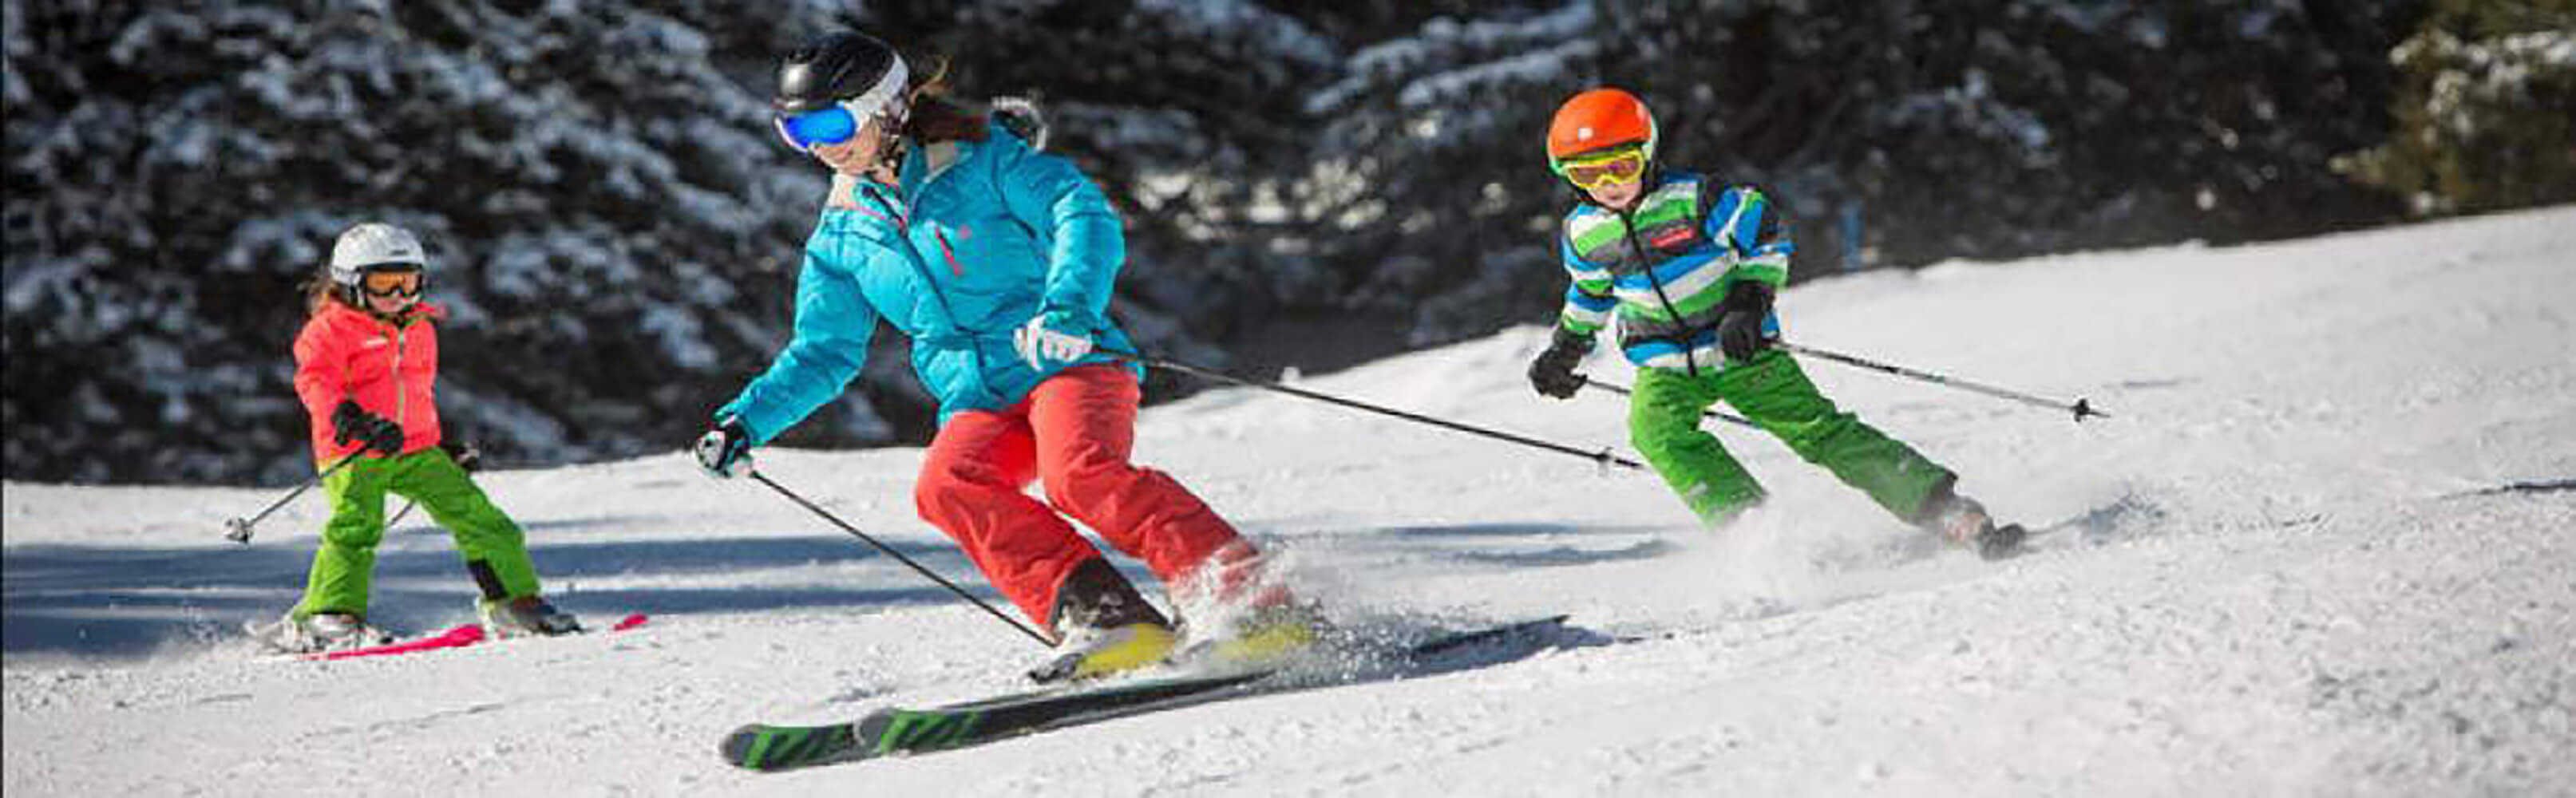 Skigebiet Brandnertal 1